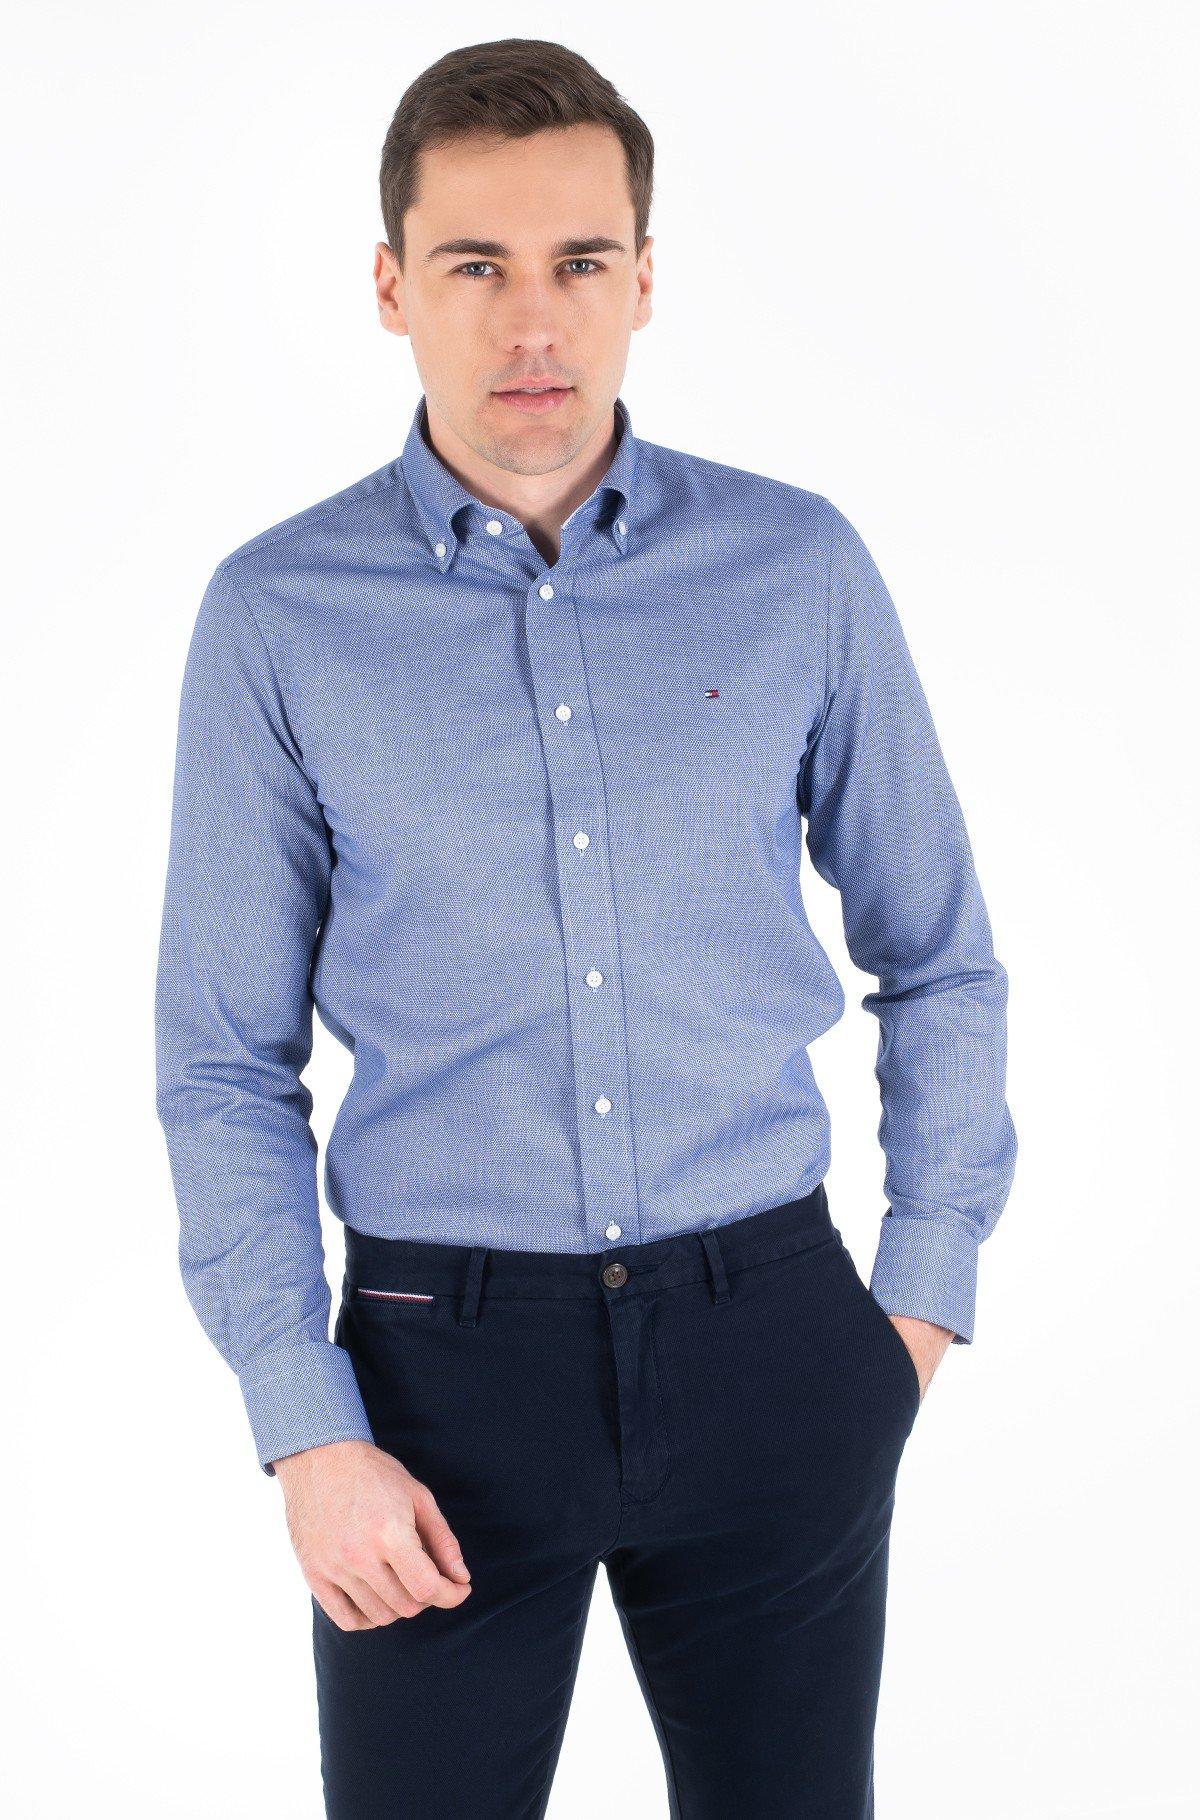 Marškiniai DOBBY BUTTON DOWN SHIRT-full-1